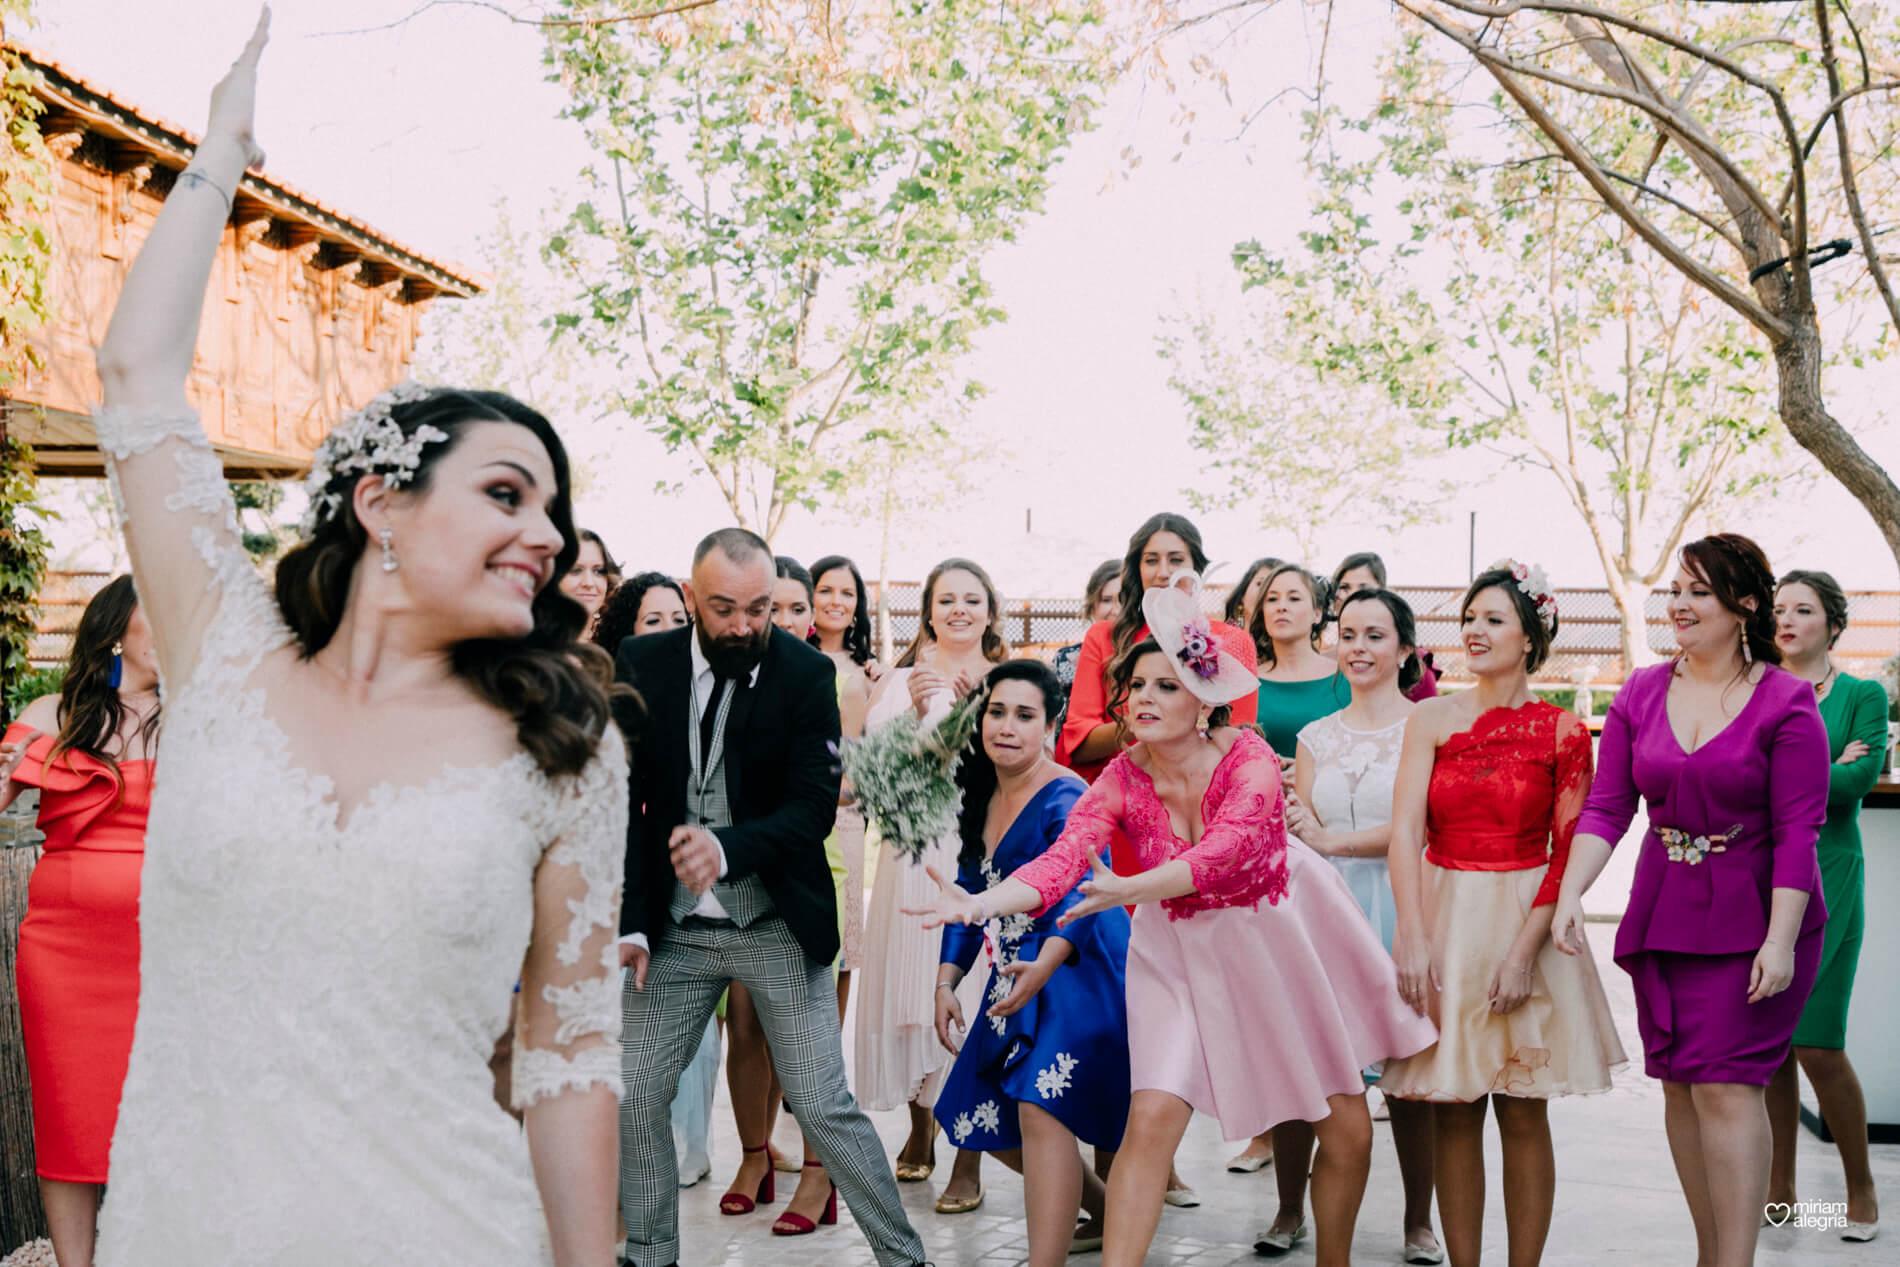 boda-en-finca-jurosa-miriam-alegria-137